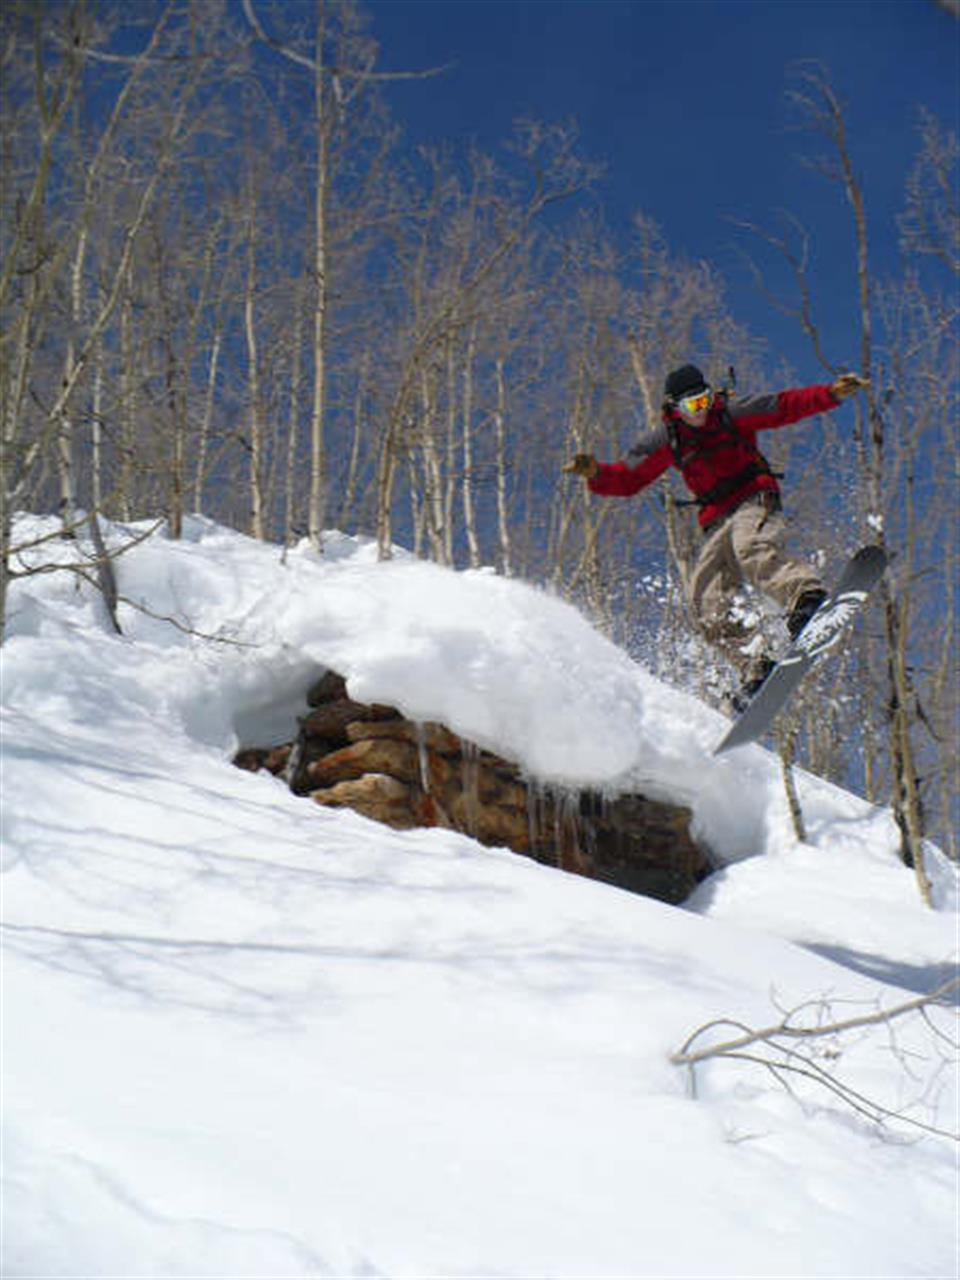 Snowboarding near Boulder, CO